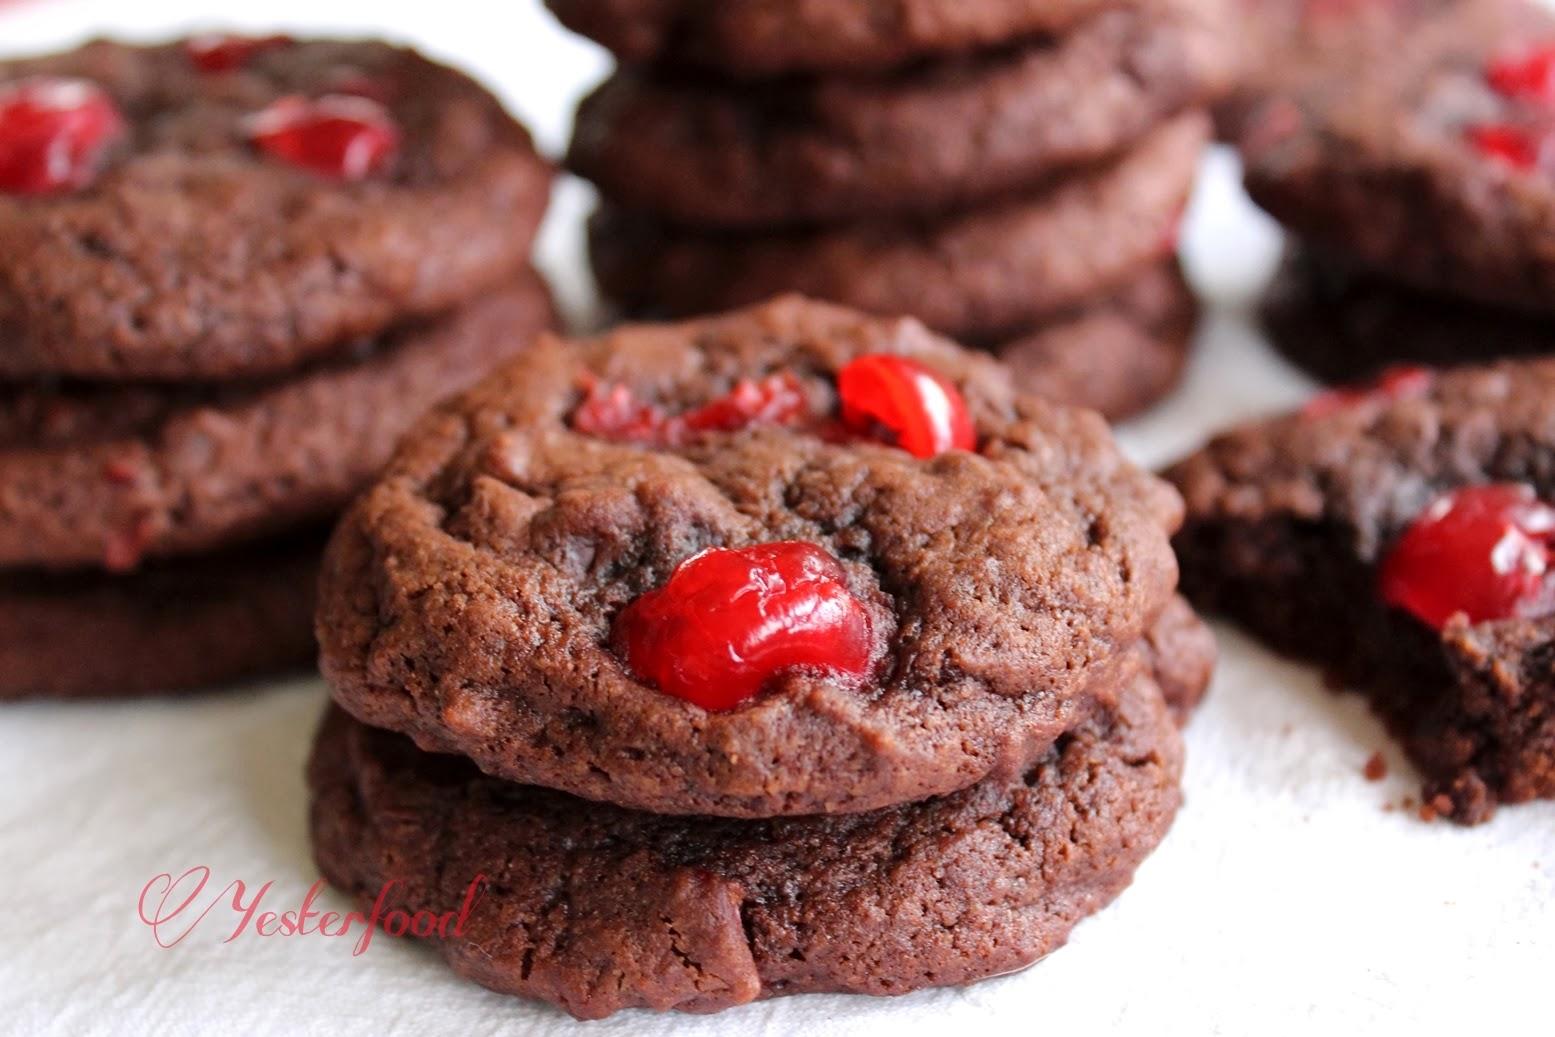 Yesterfood double chocolate cherry cookies